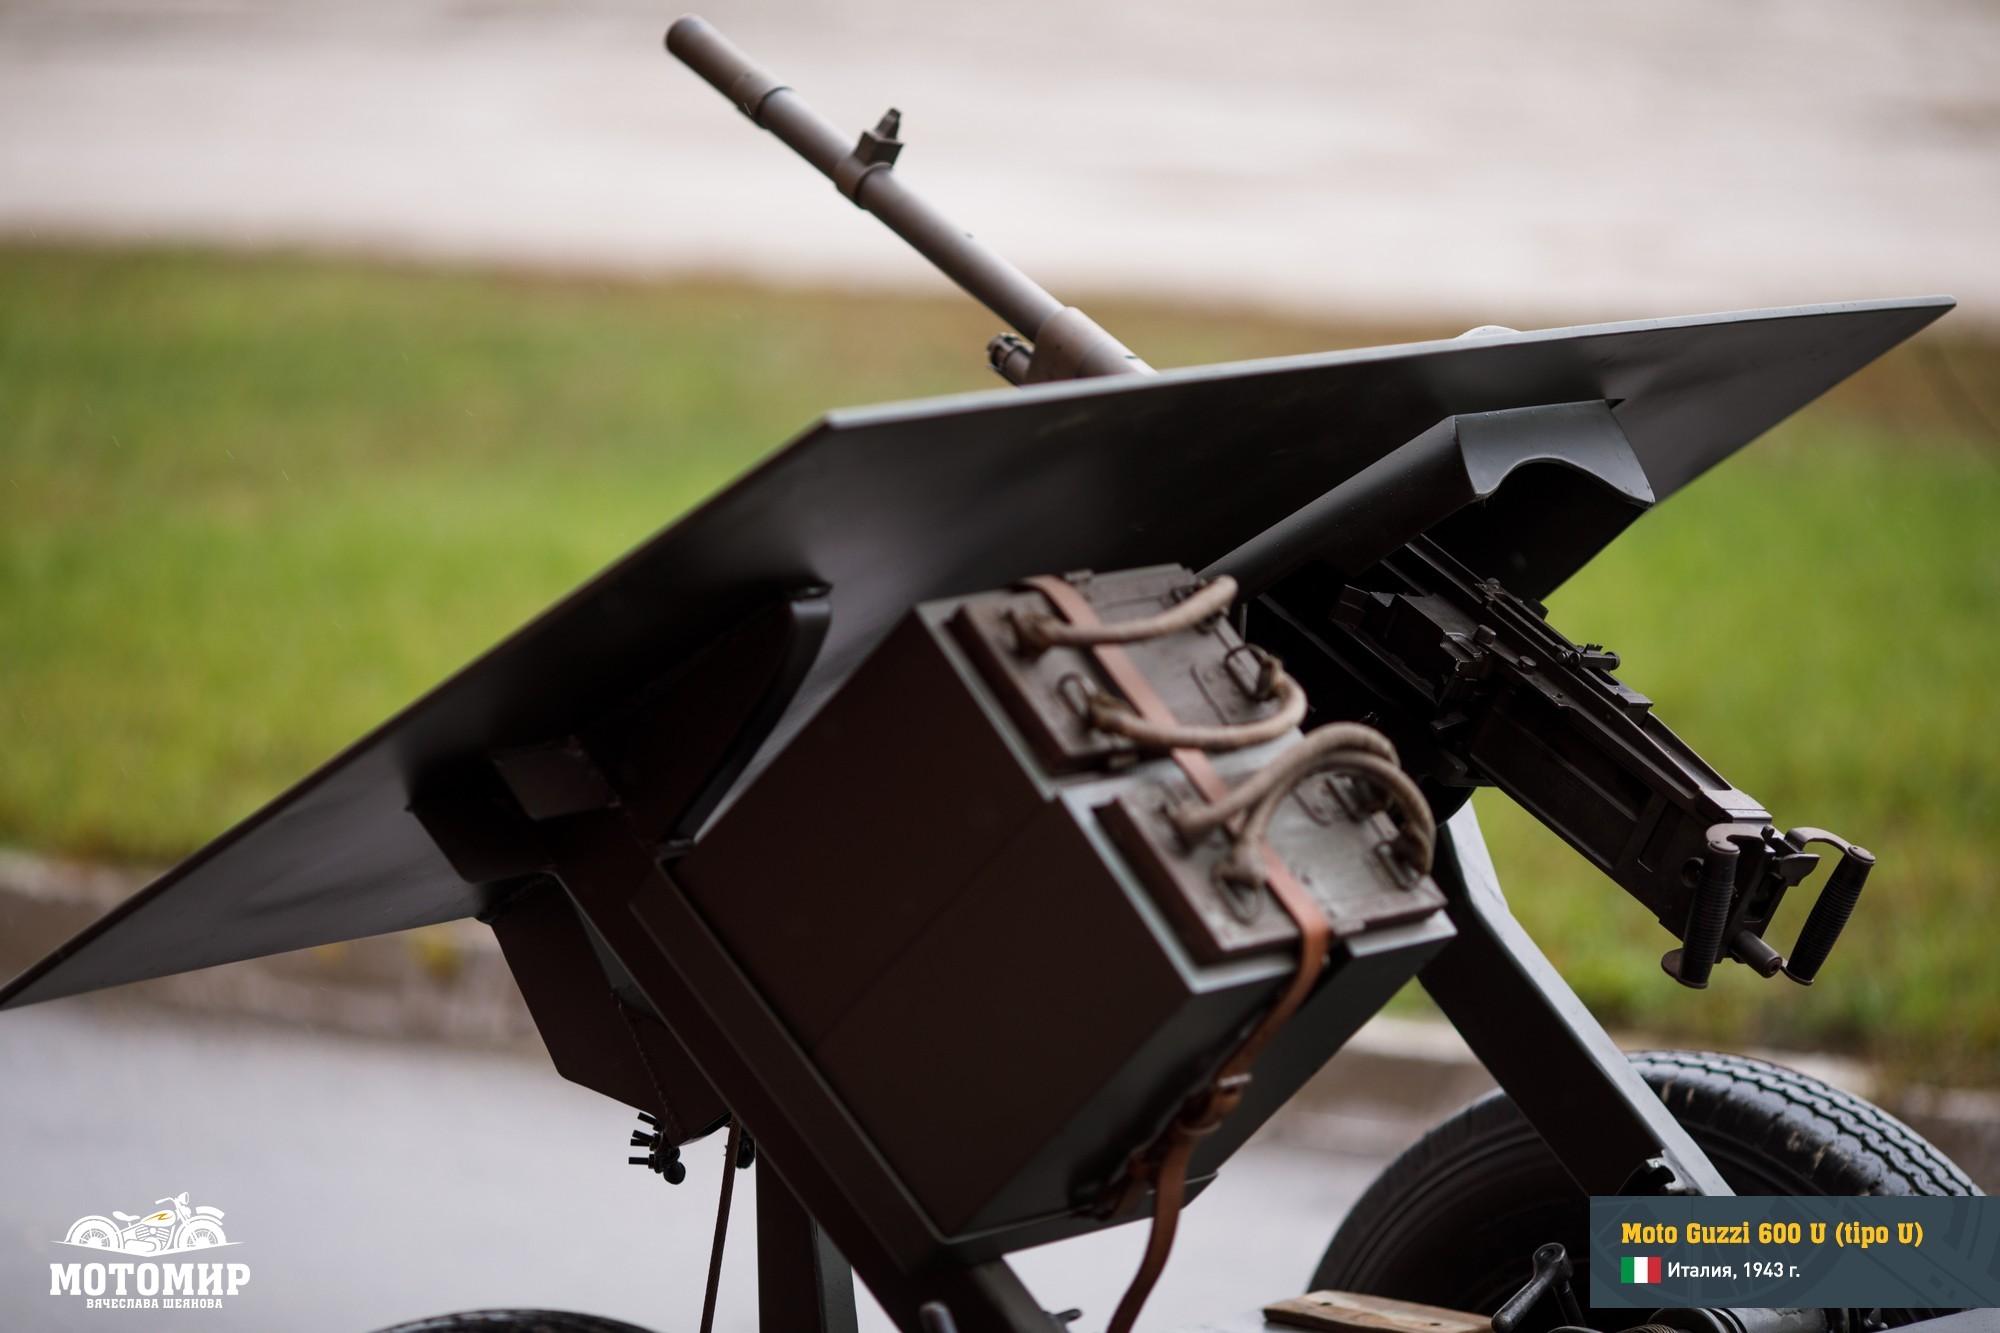 moto-guzzi-600-u-web-19